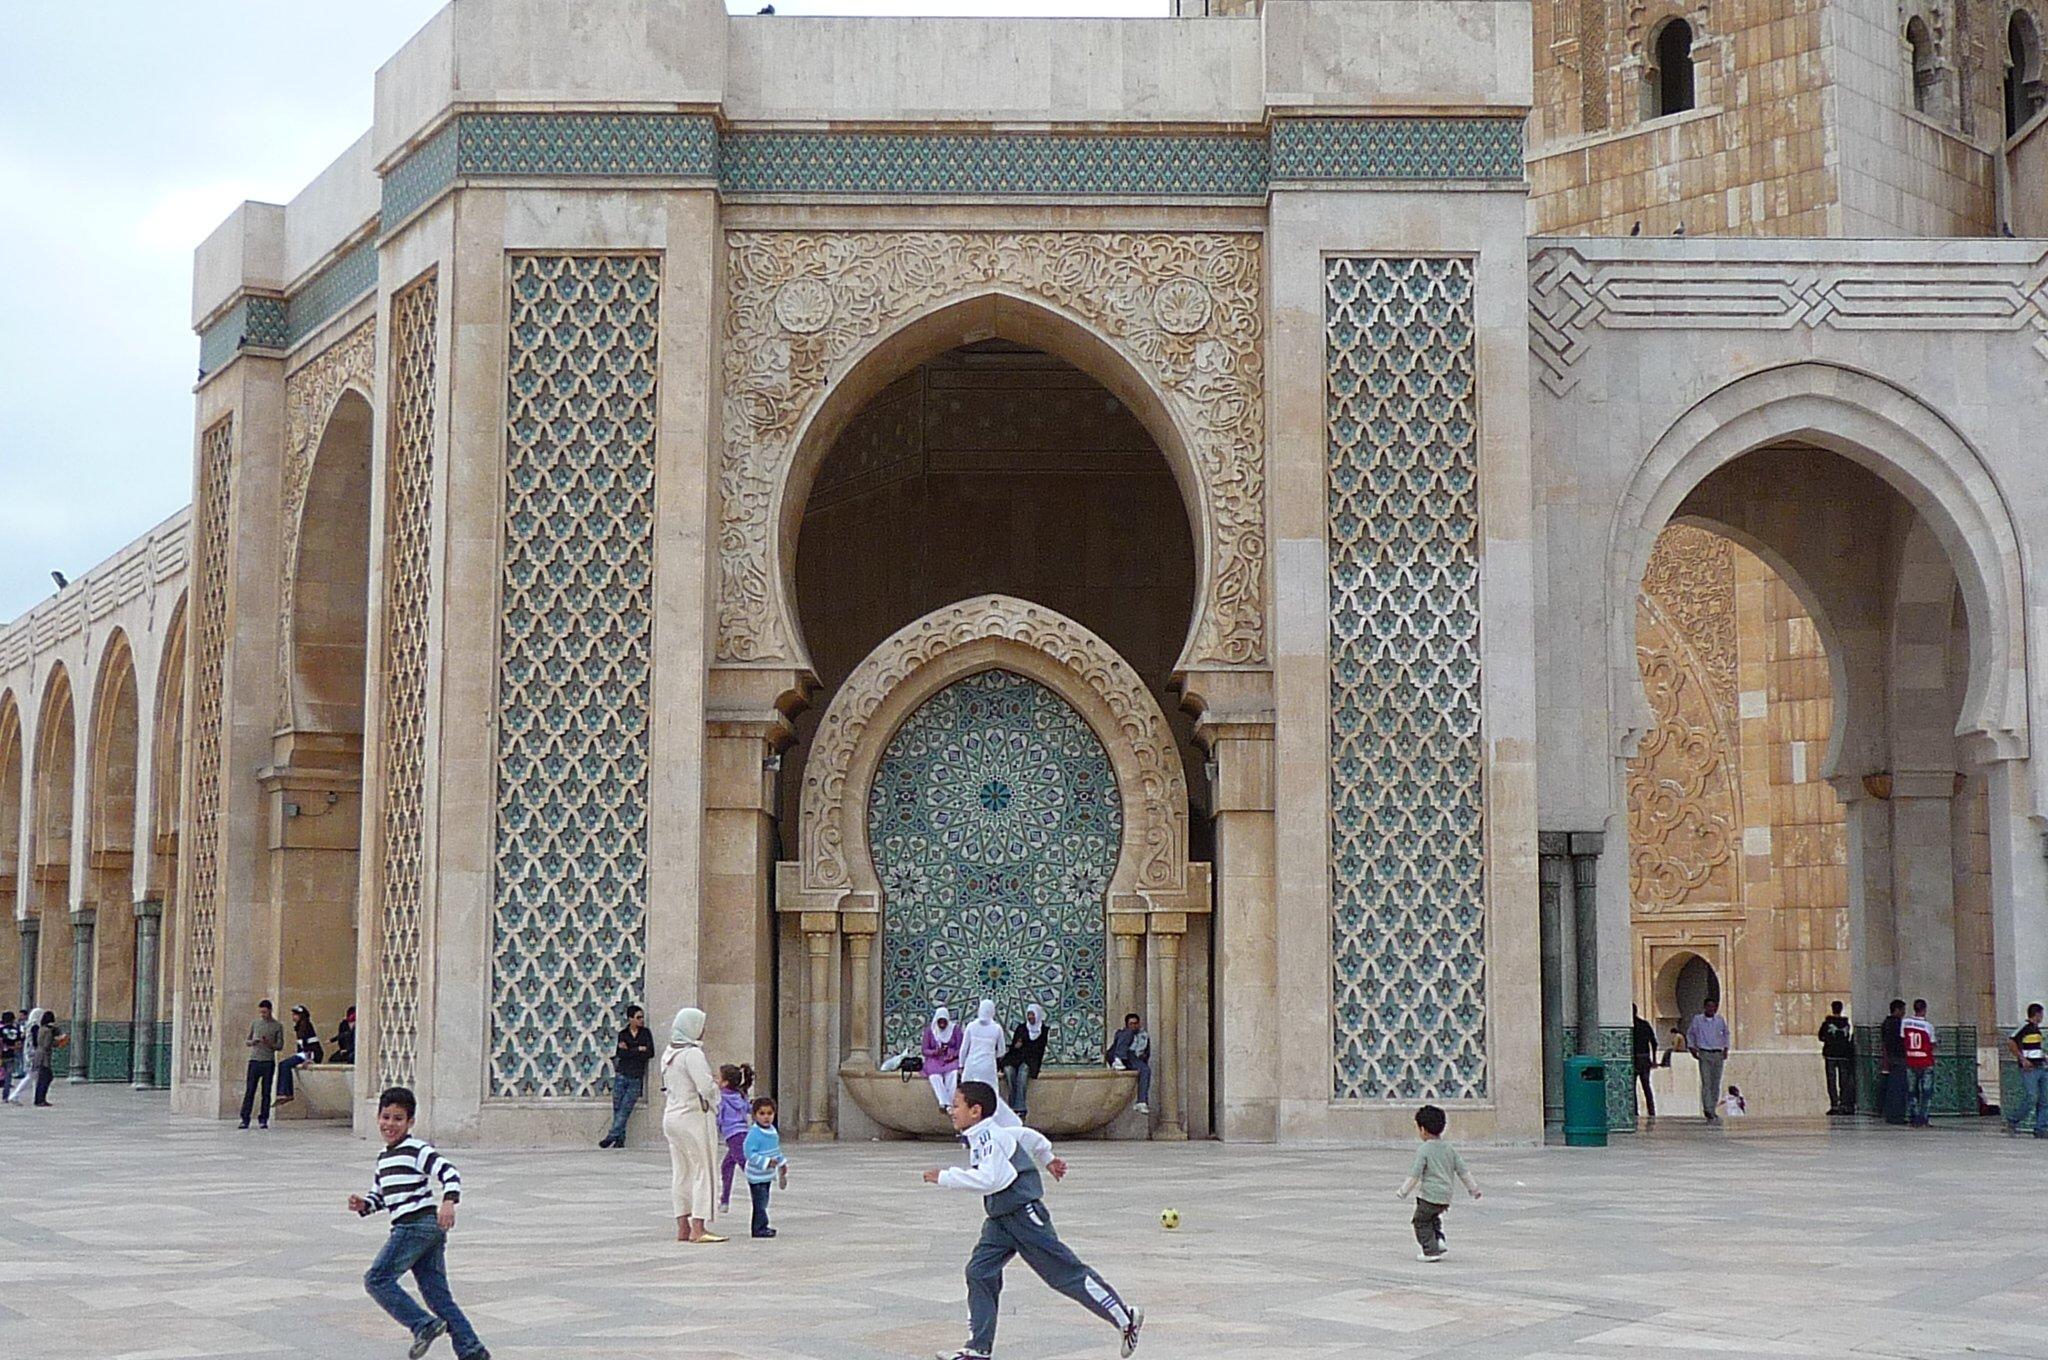 https://www.caravan-serai.com/wp-content/uploads/2016/08/TunisMoroc-838.jpg